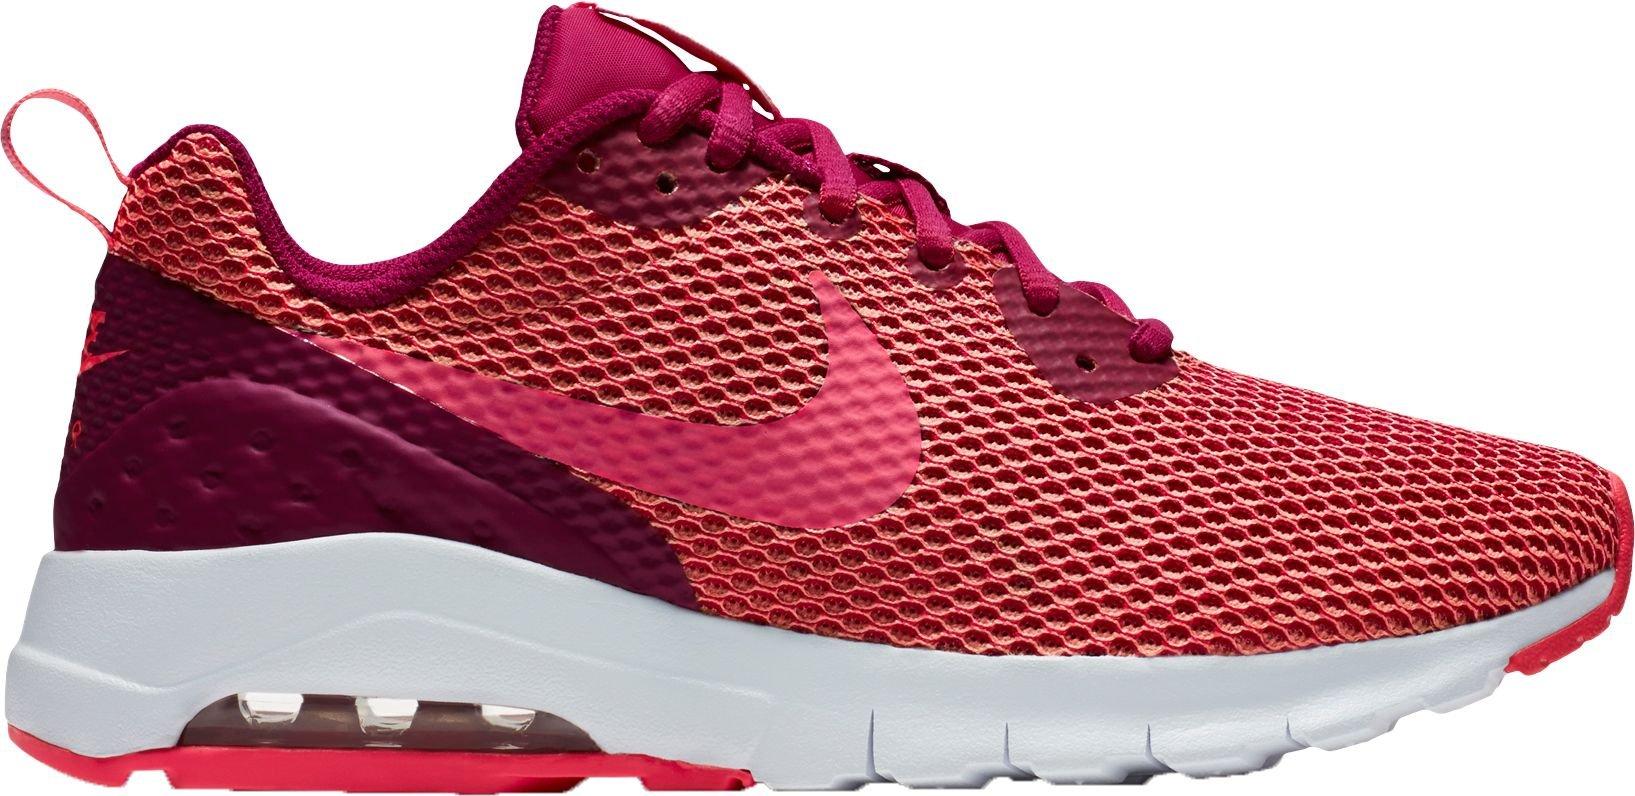 Nike Women's Air Max Motion Low SE Shoes(Sport Fushsia/Racer Pink, 9.5 B(M) US)